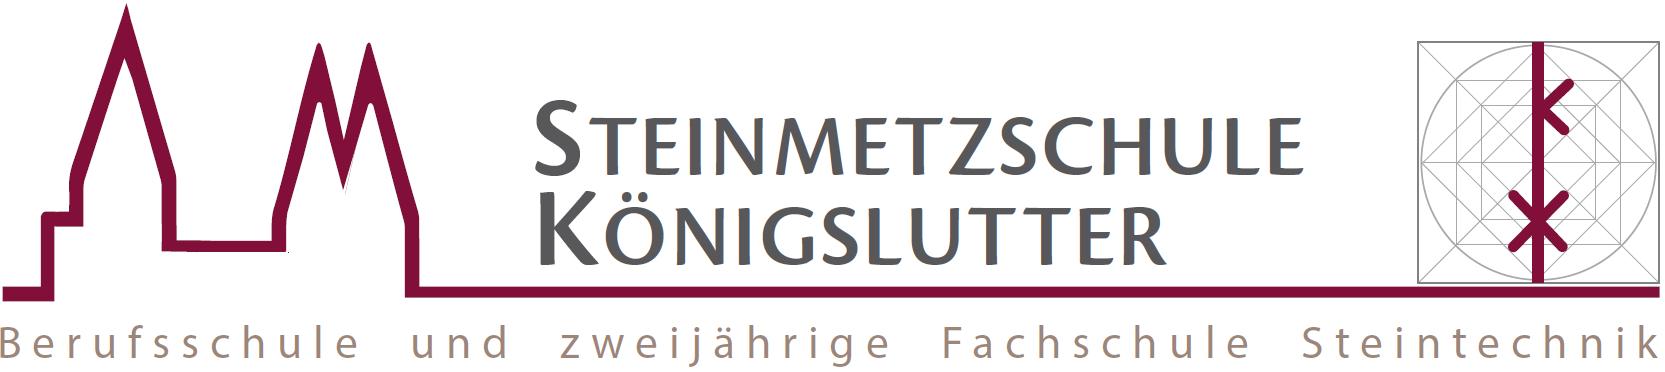 Steinmetzschule Königslutter